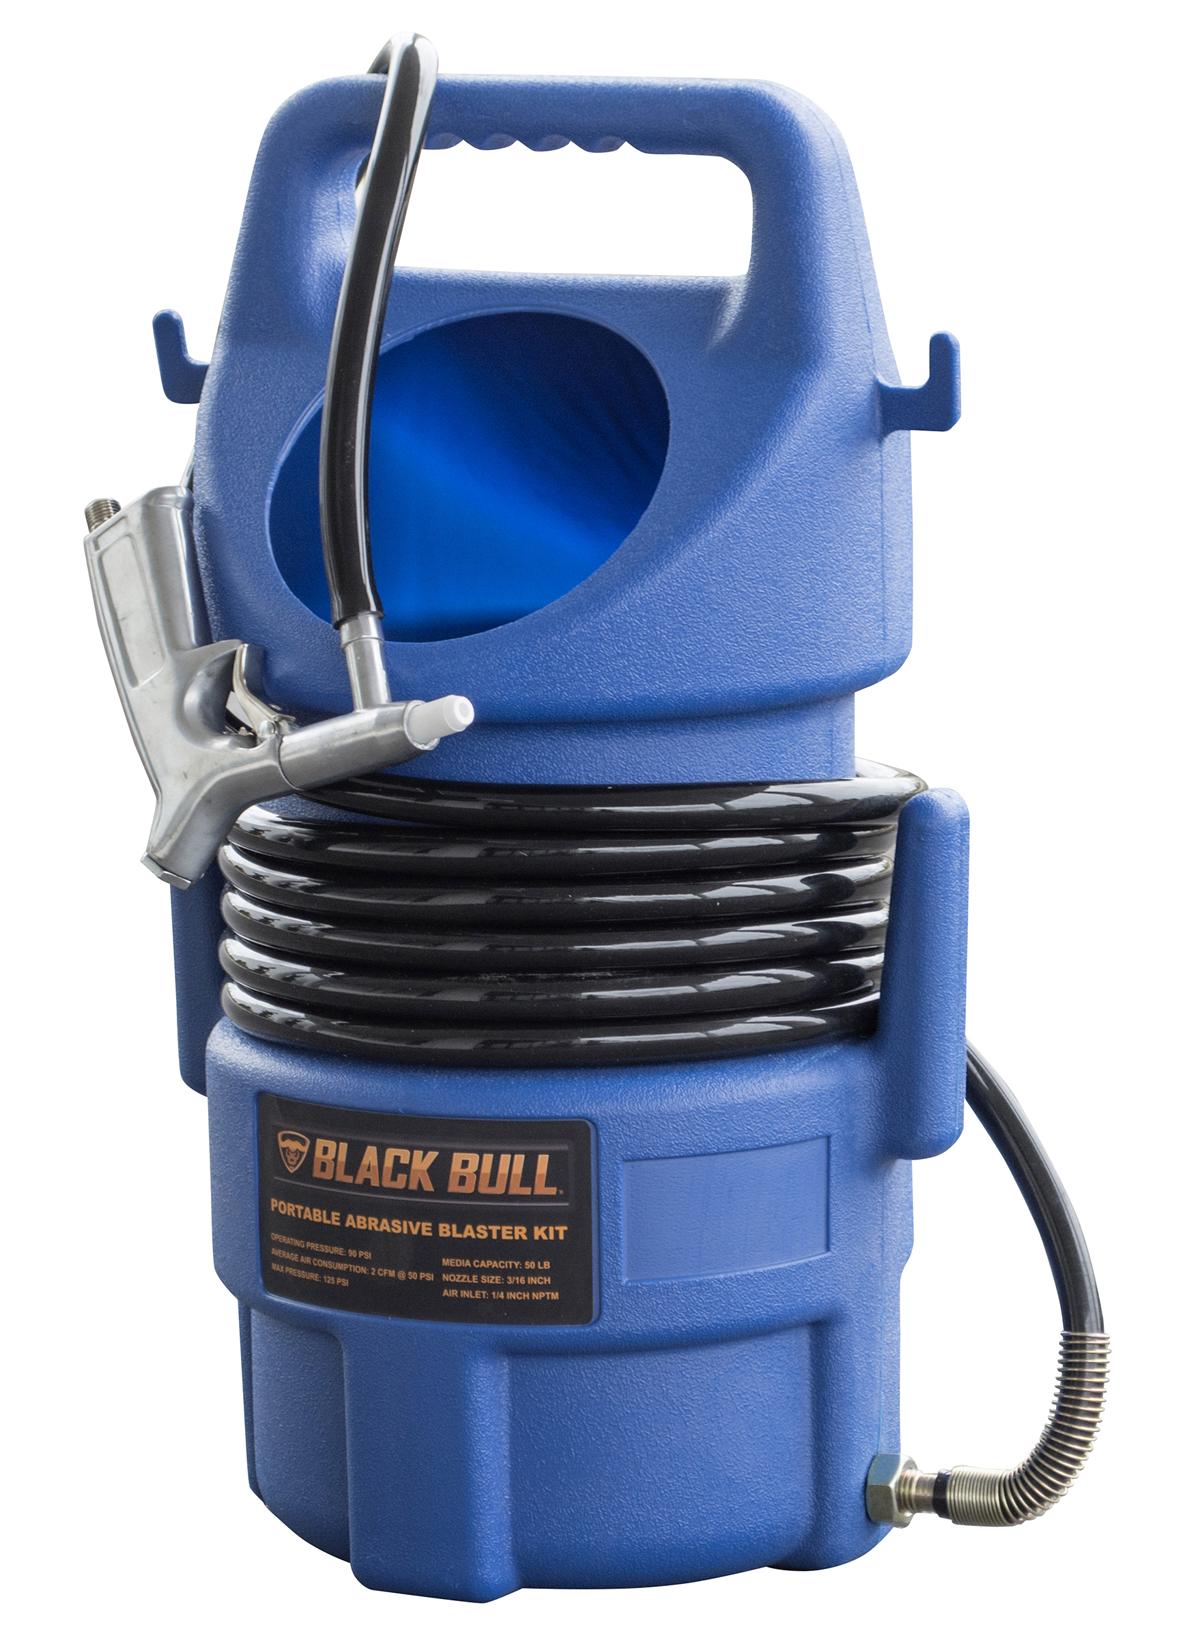 50 Lbs Capacity Portable Abrasive Blaster Kit